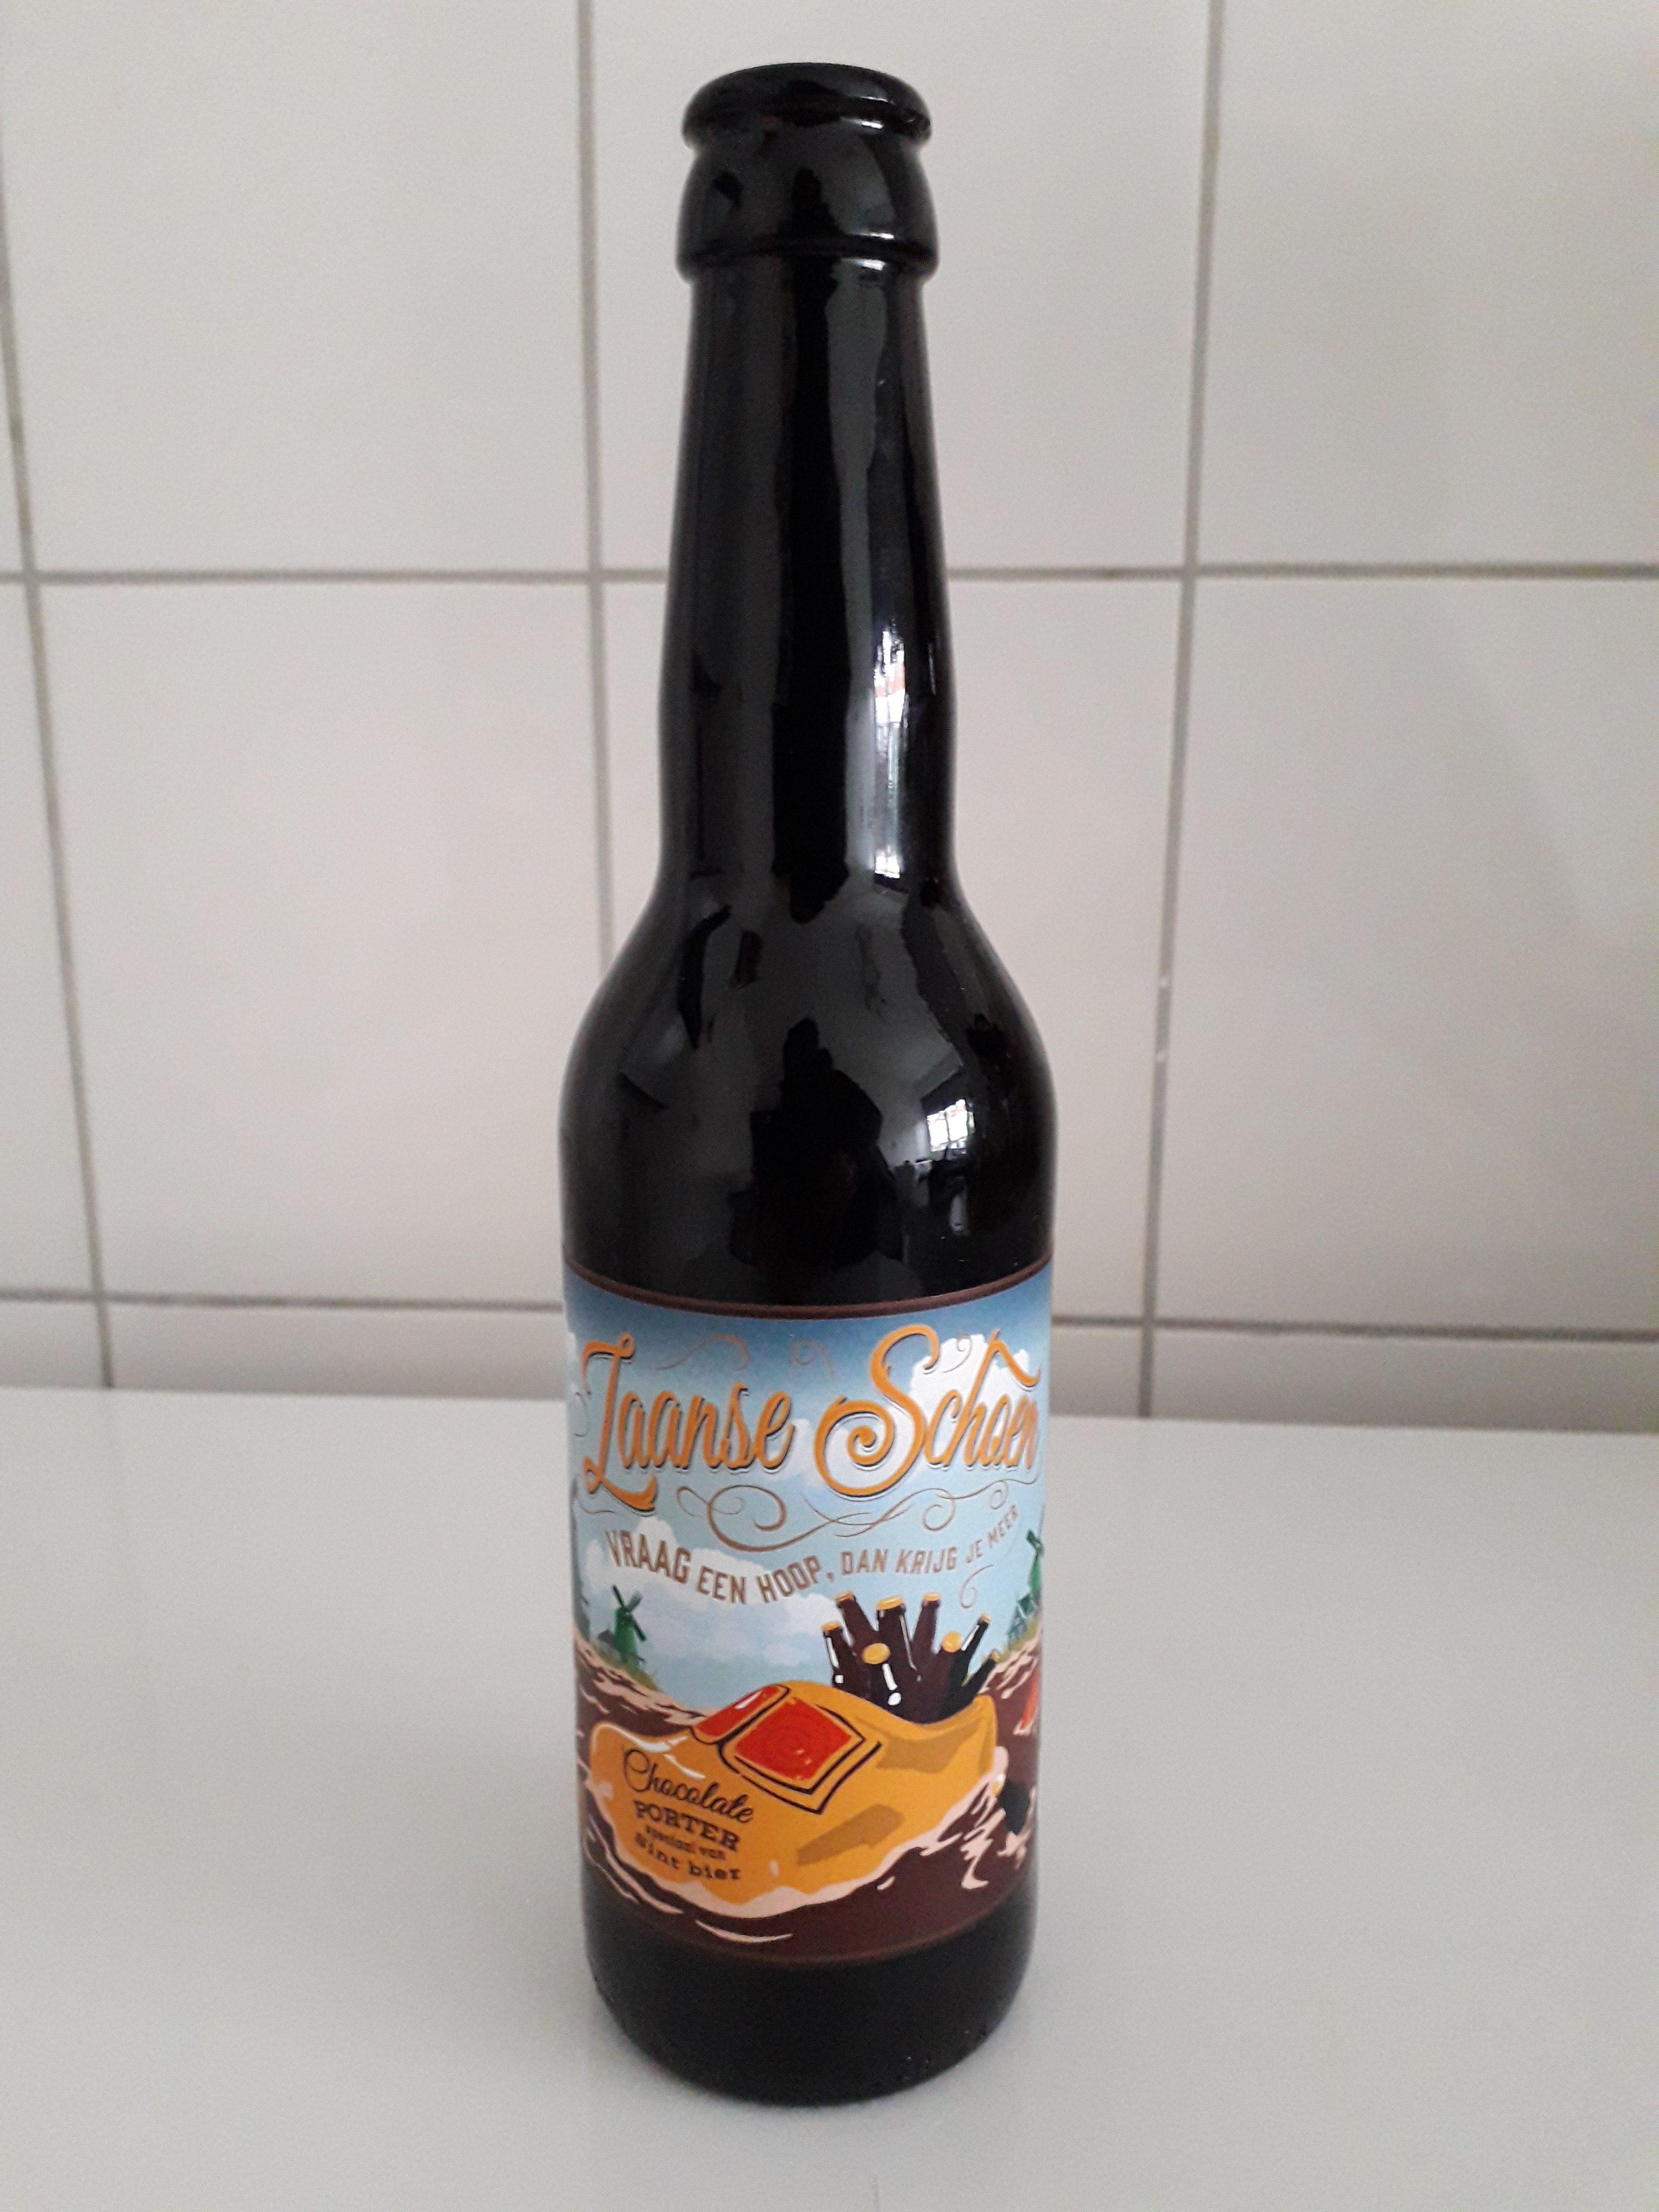 De Zaanse Schoen bier